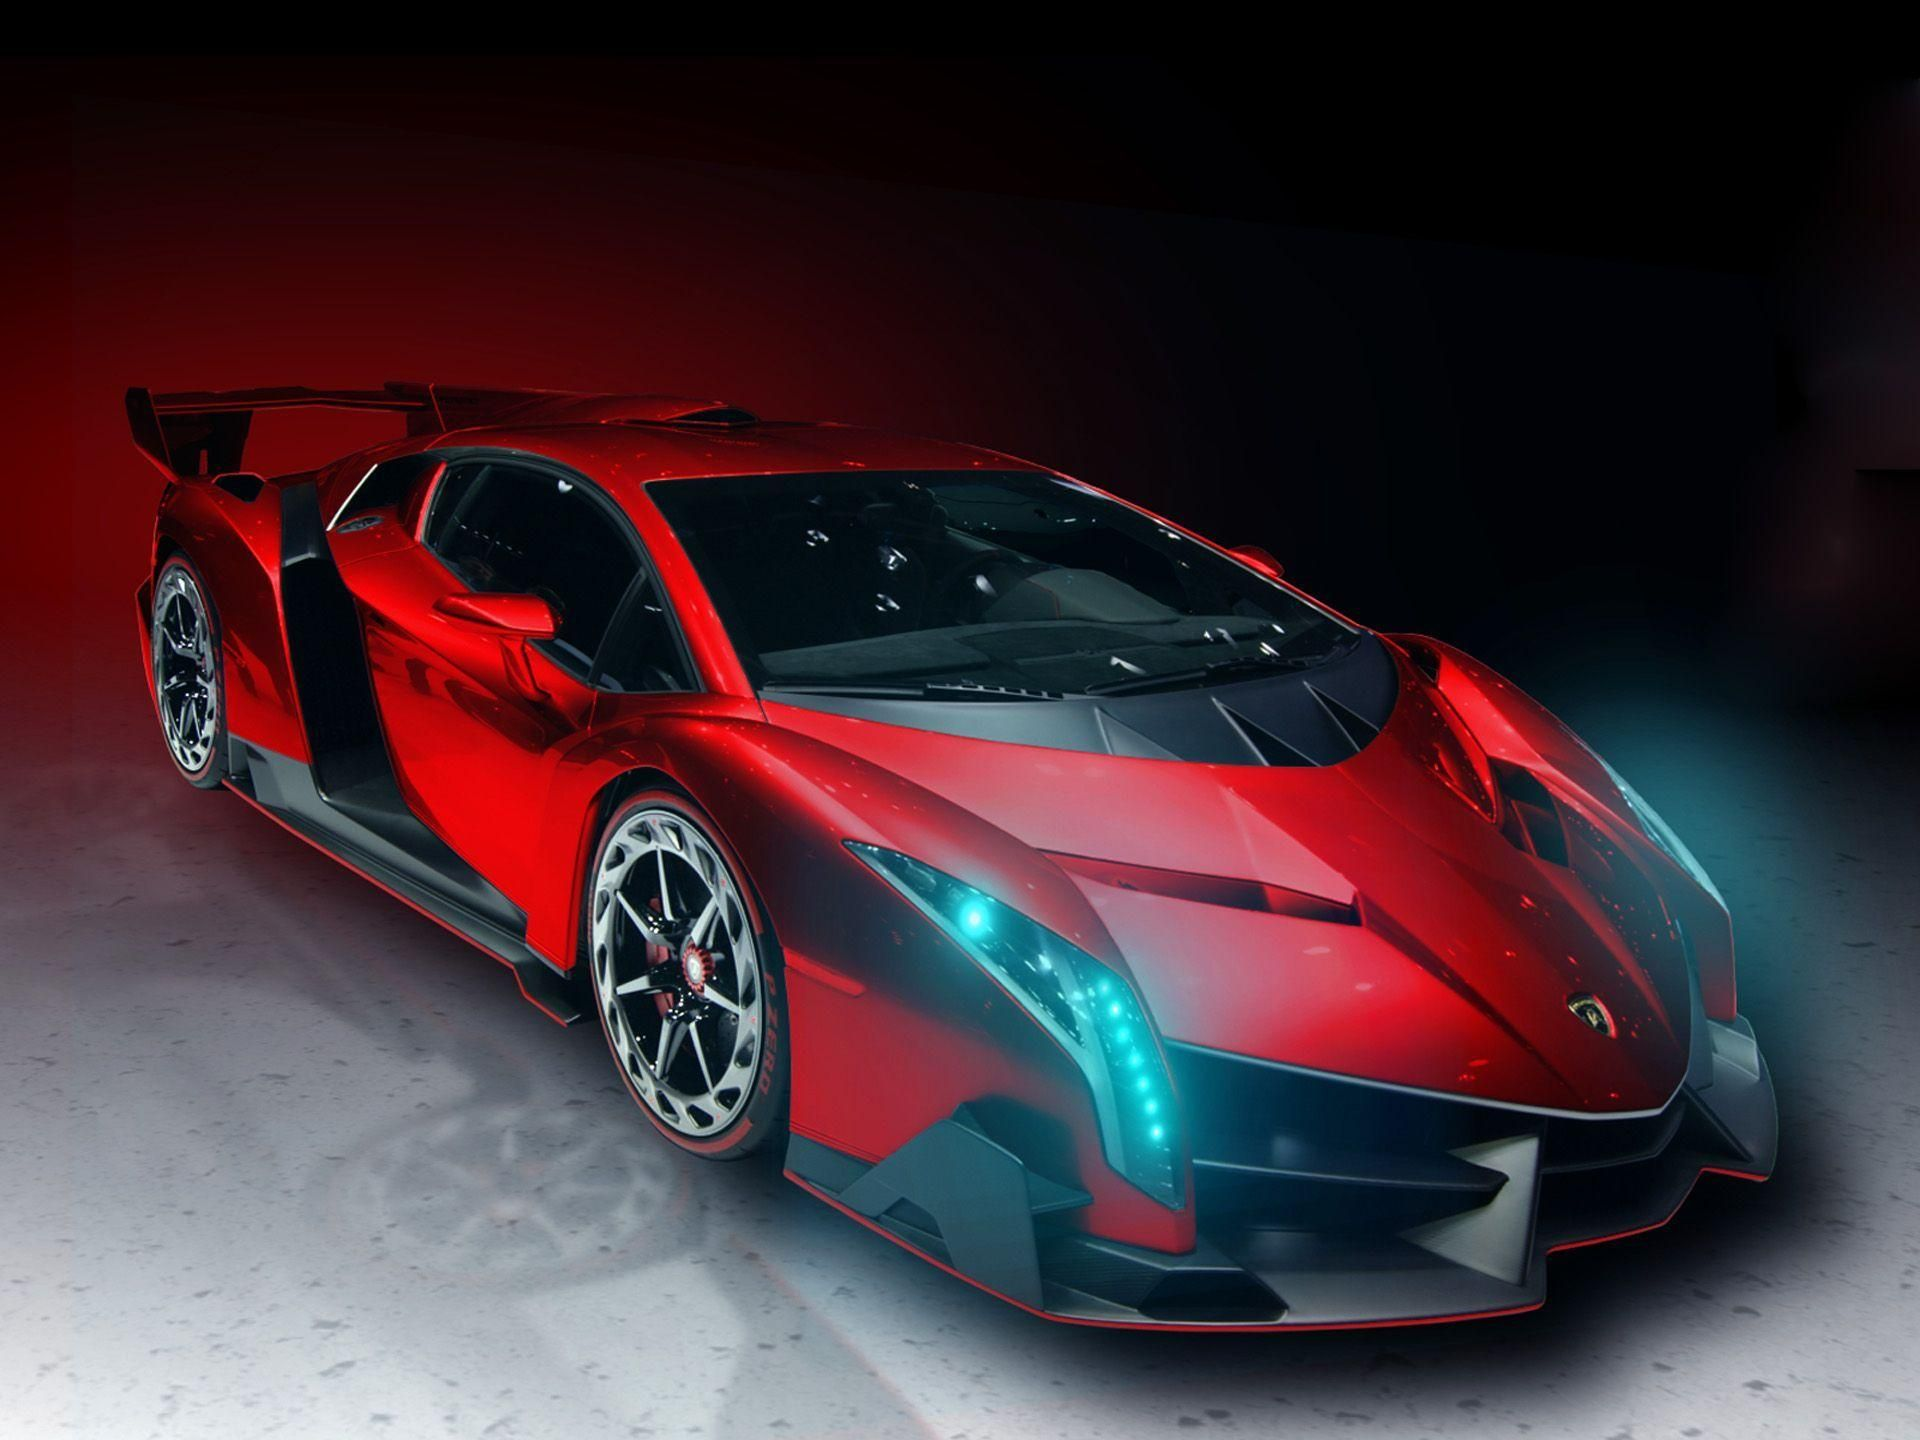 Cool Wallpaper Car Rainbow Lamborghini Images In 2020 Lamborghini Veneno Cool Wallpapers Cars Car Wallpapers